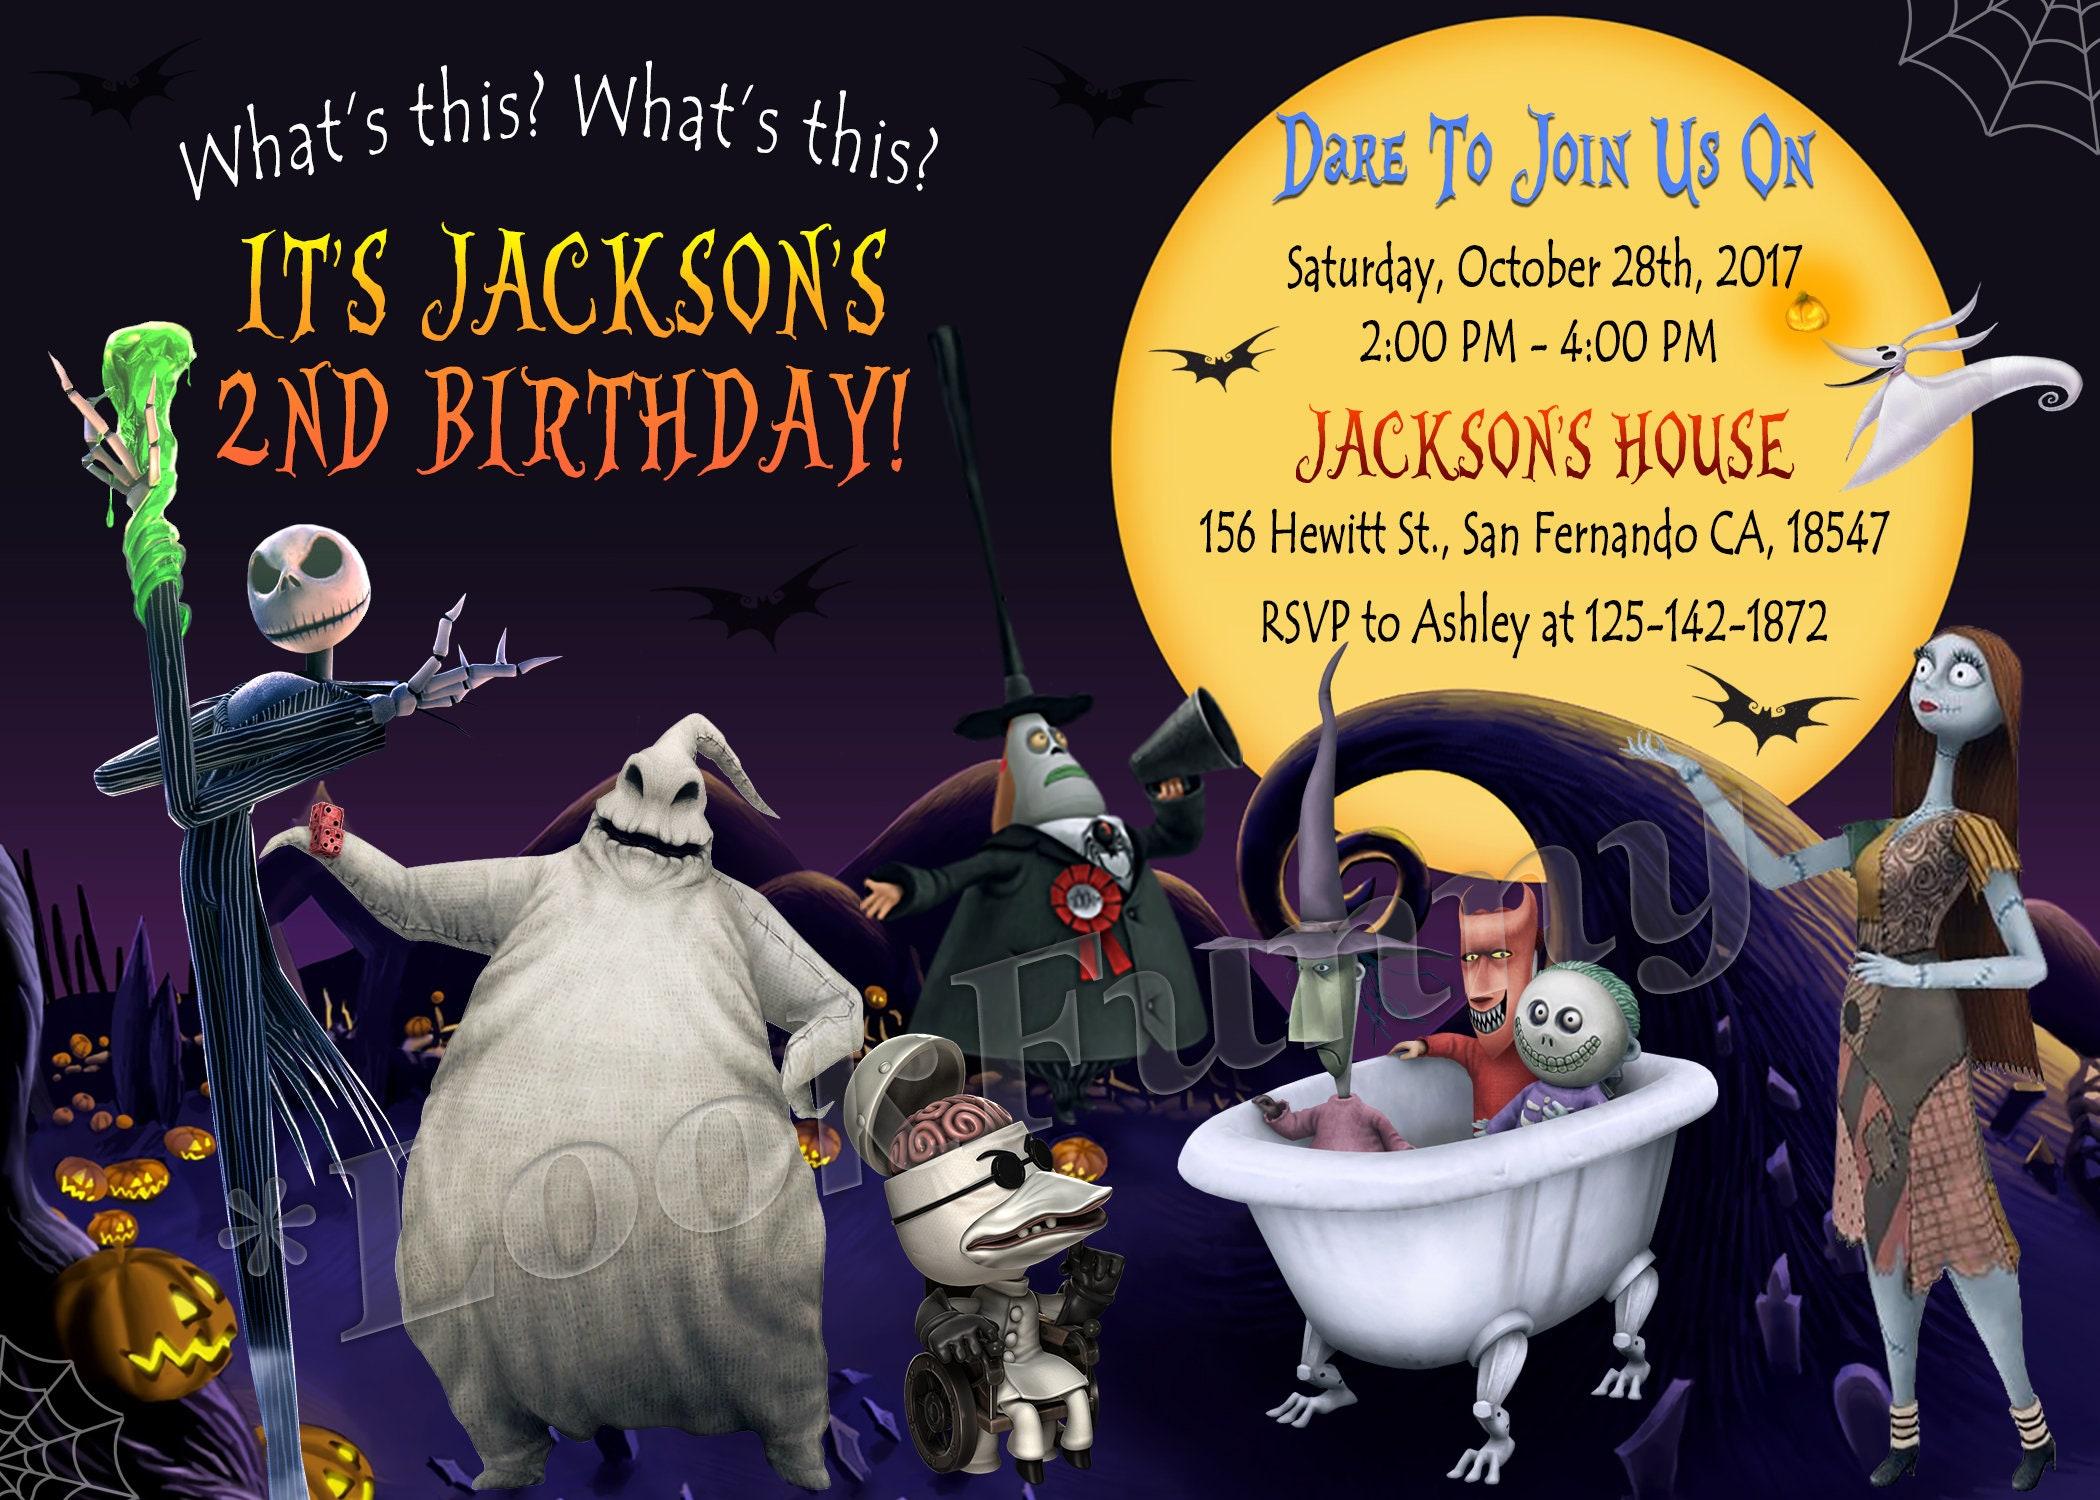 The Nightmare Before Christmas Invitation Halloween Printable | Etsy